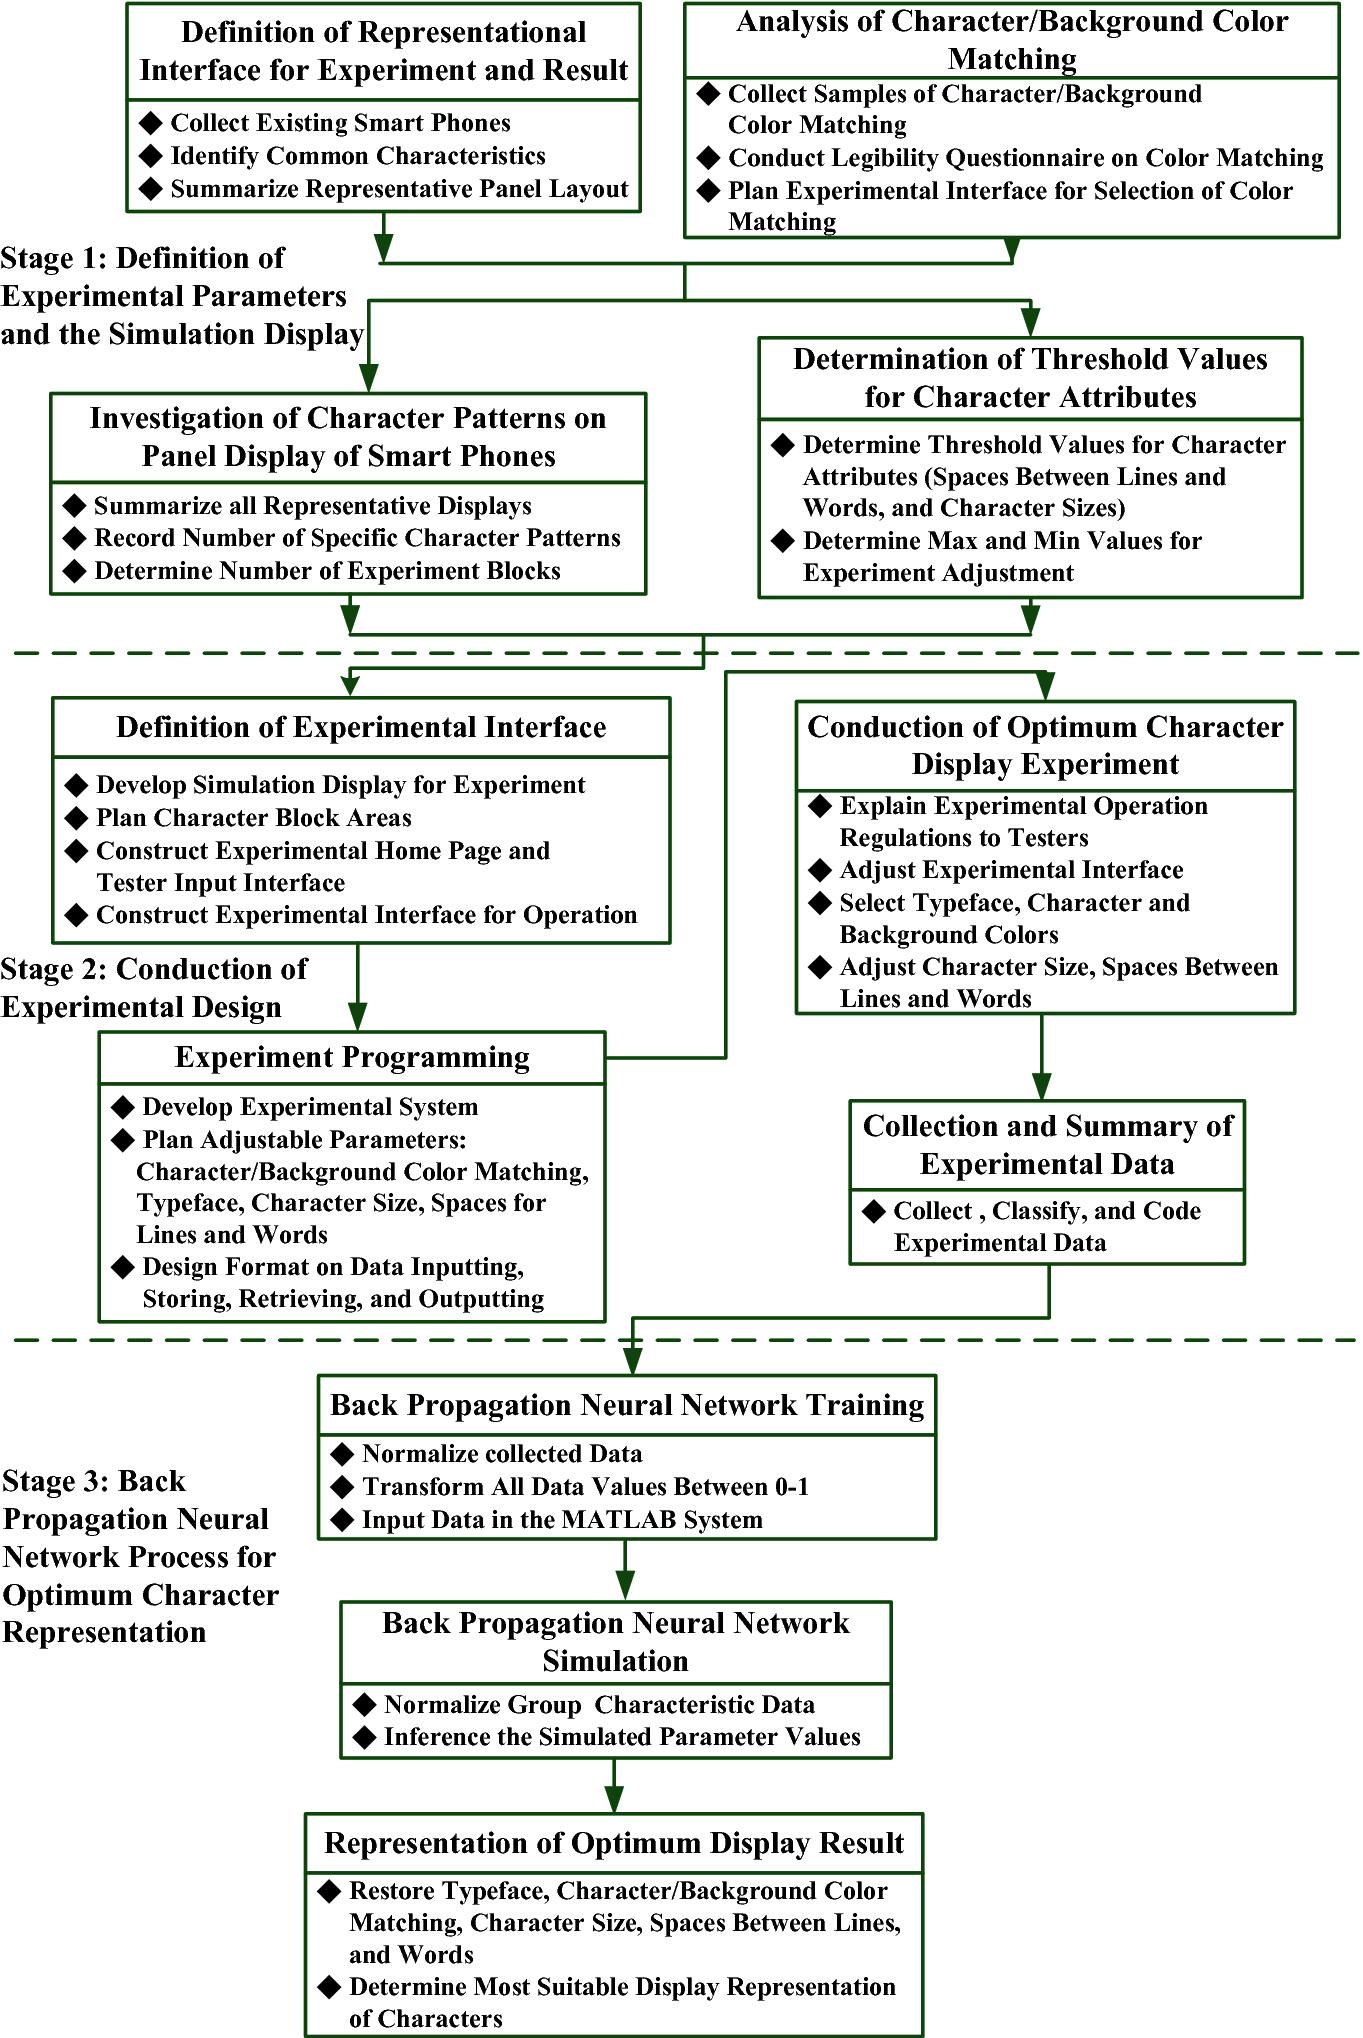 A Study of Optimum Representation of Digital Contents on